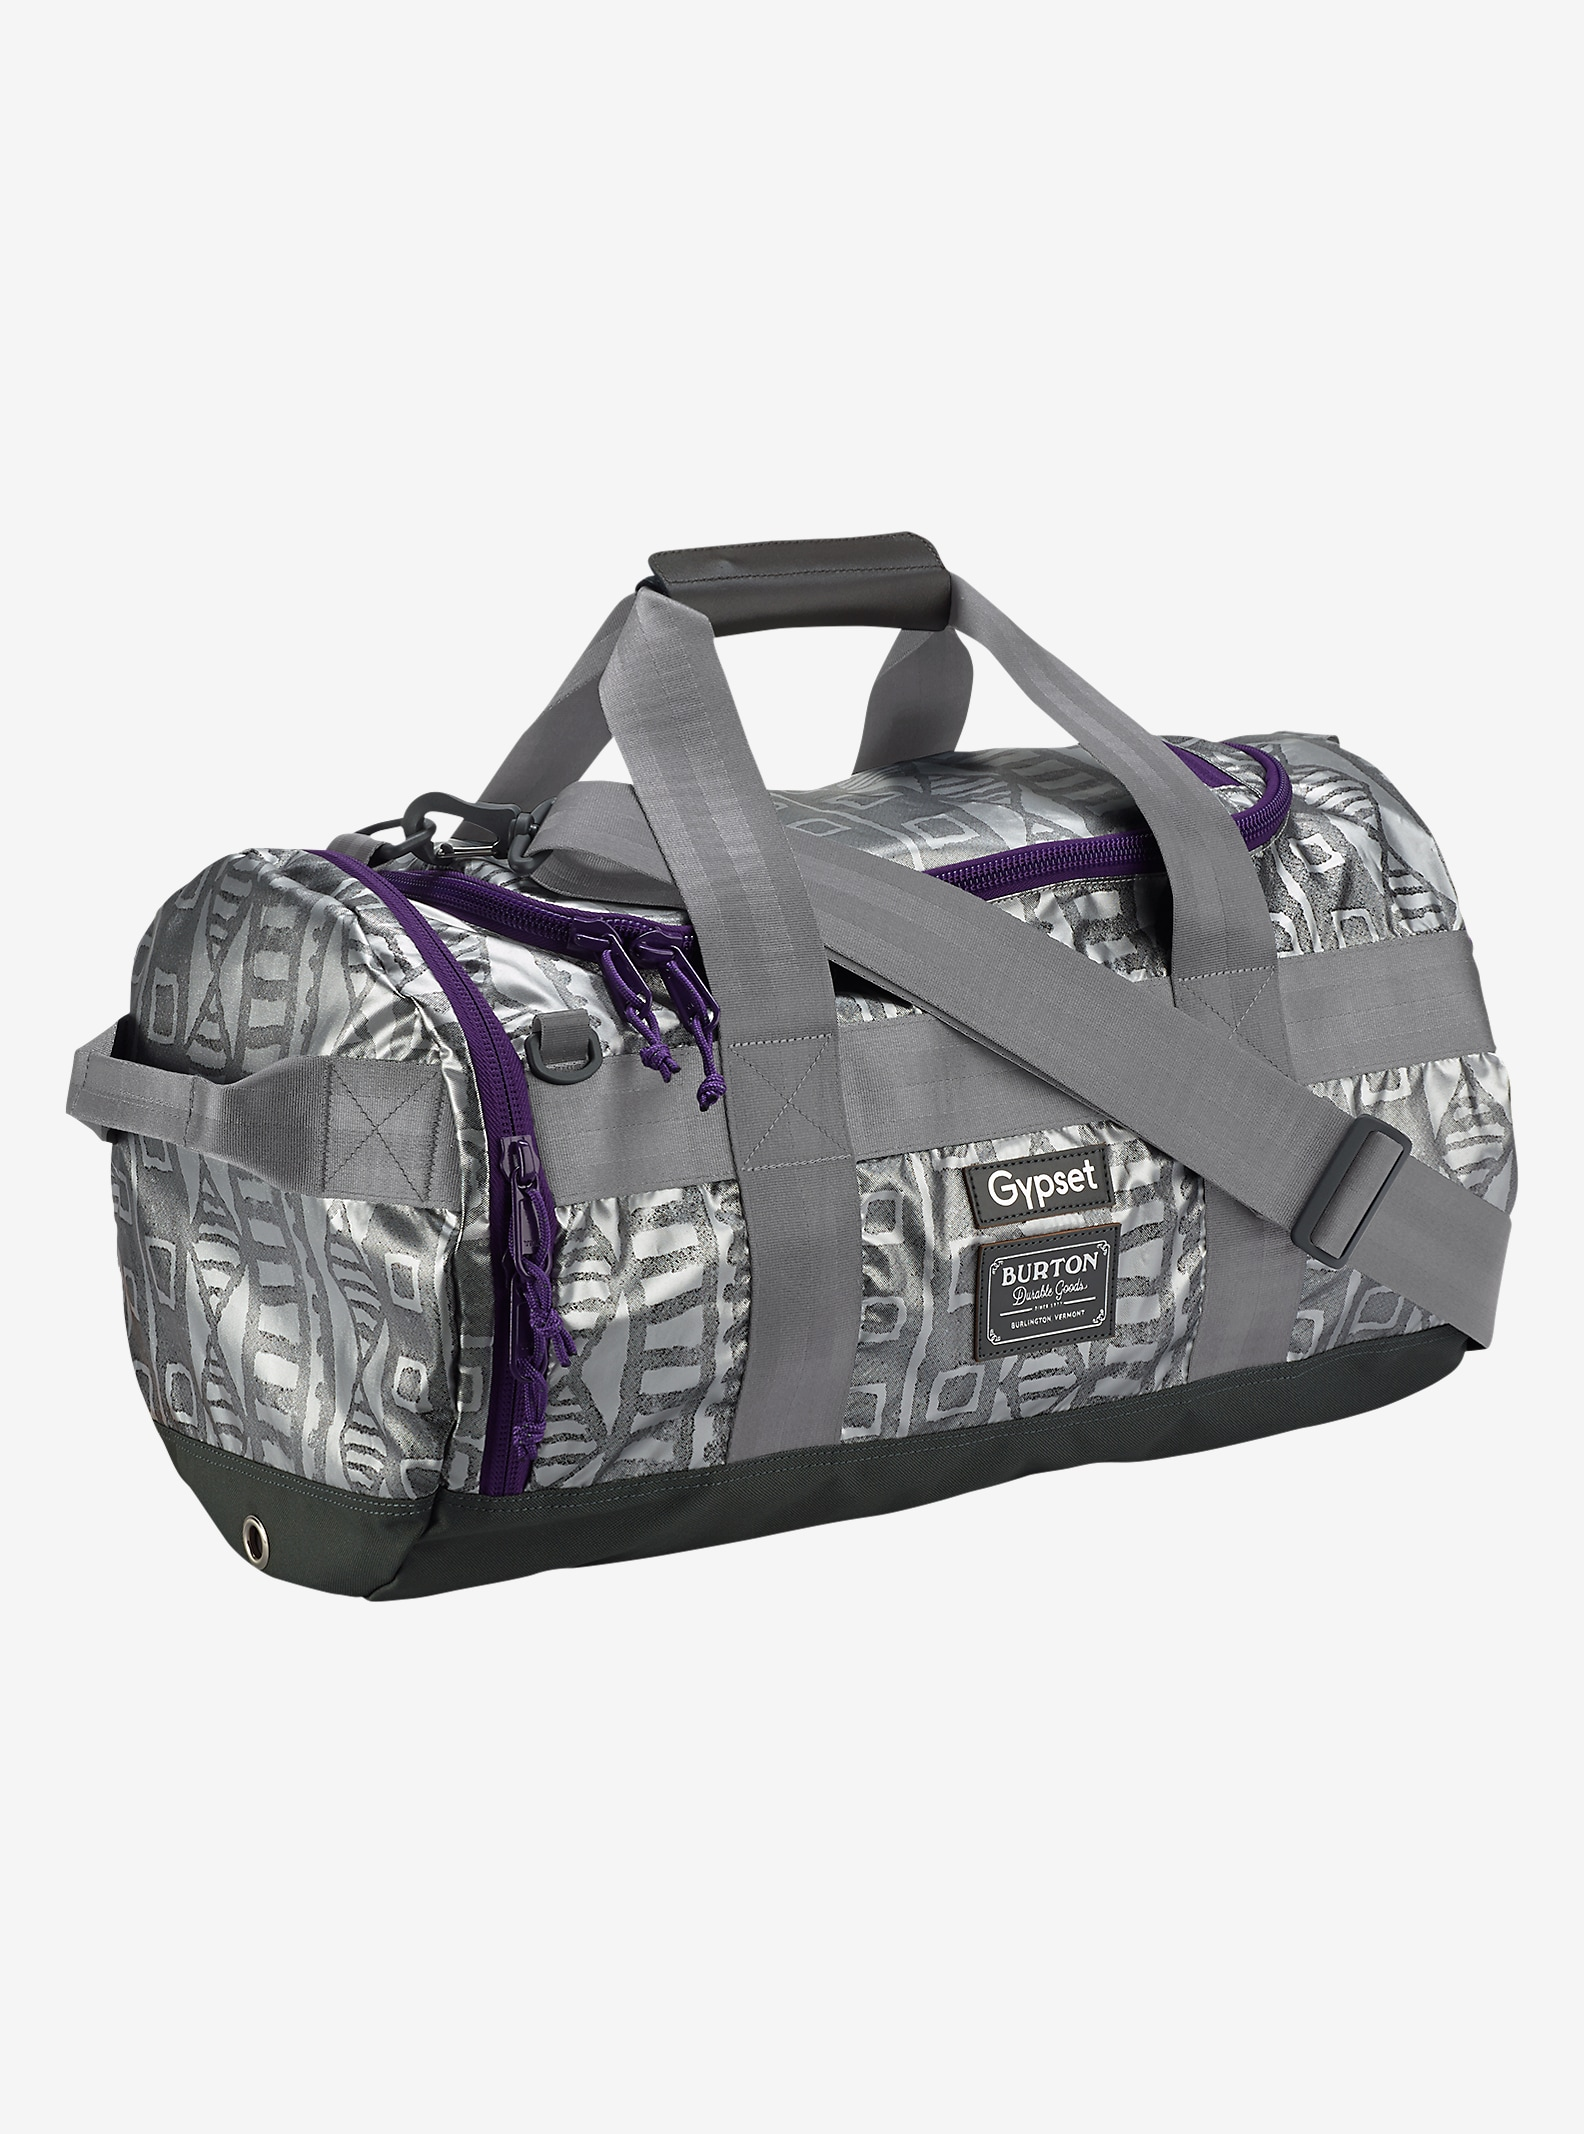 Burton x Gypset - Petit sac de sport 40 L Backhill affichage en Galactic Mudcloth